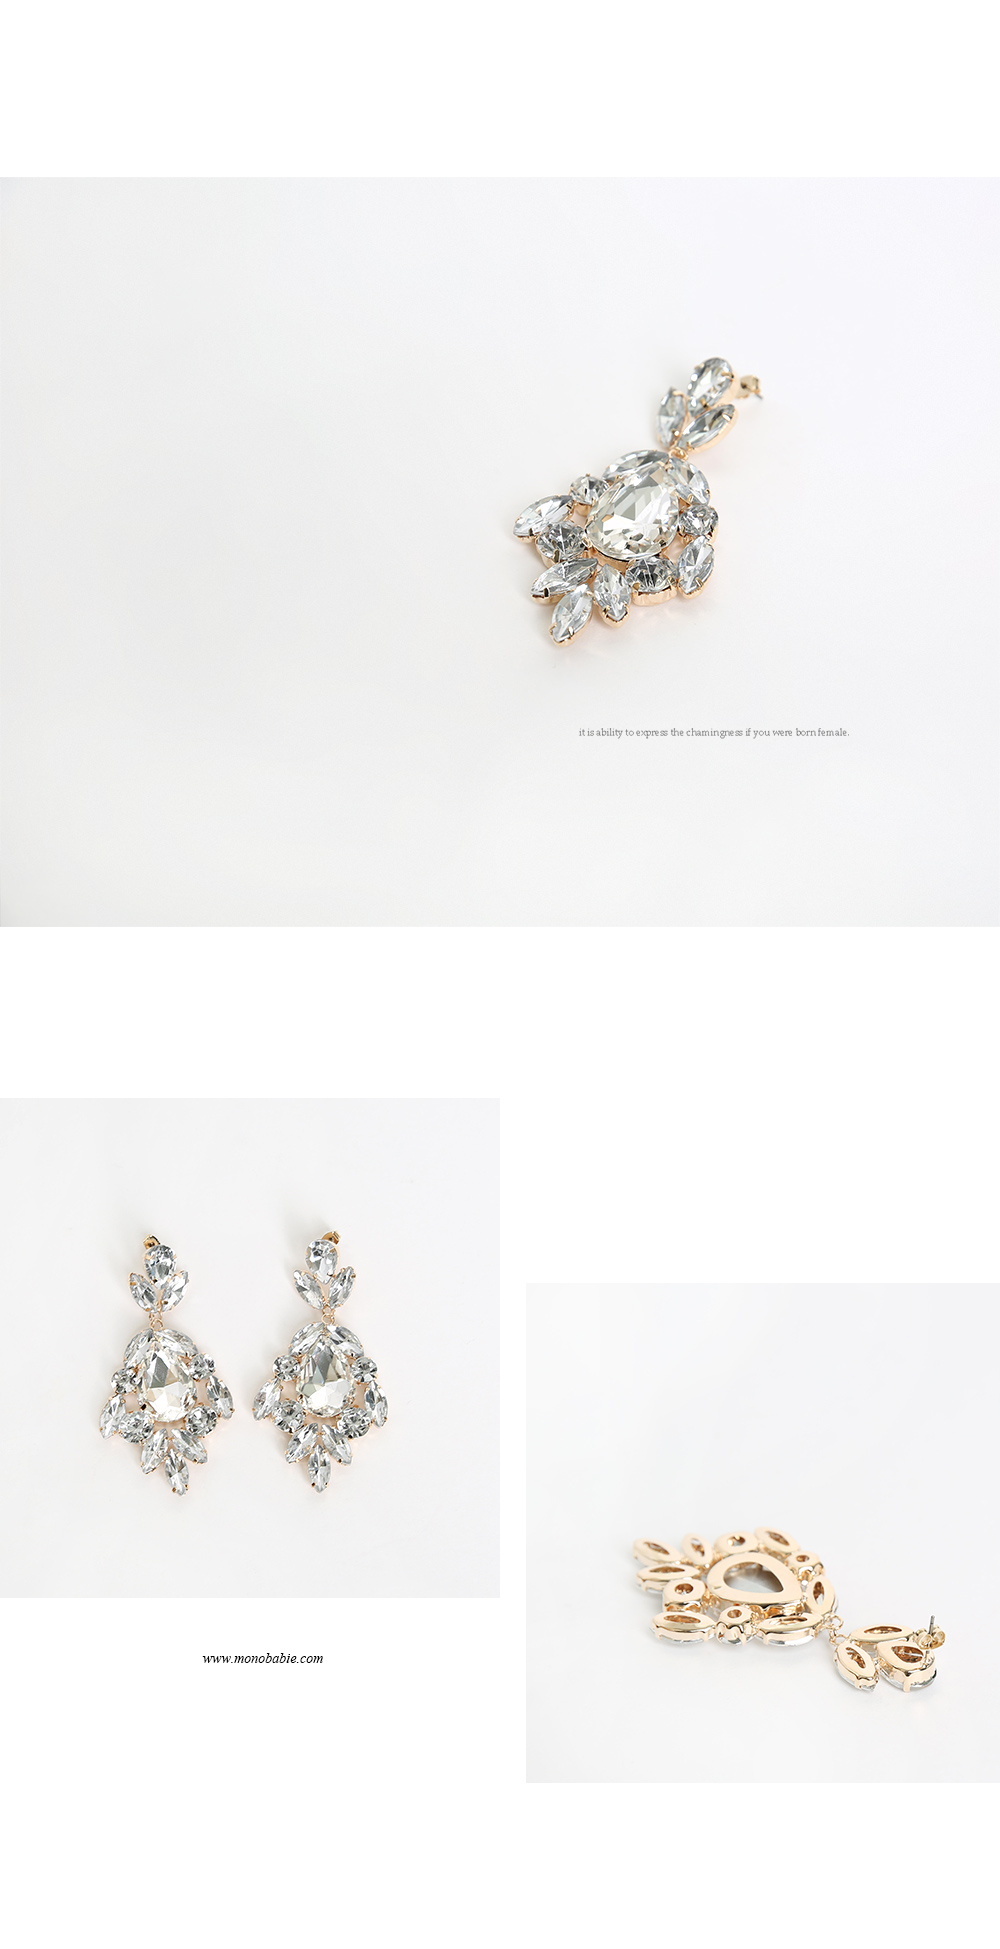 Dripping beads earrings